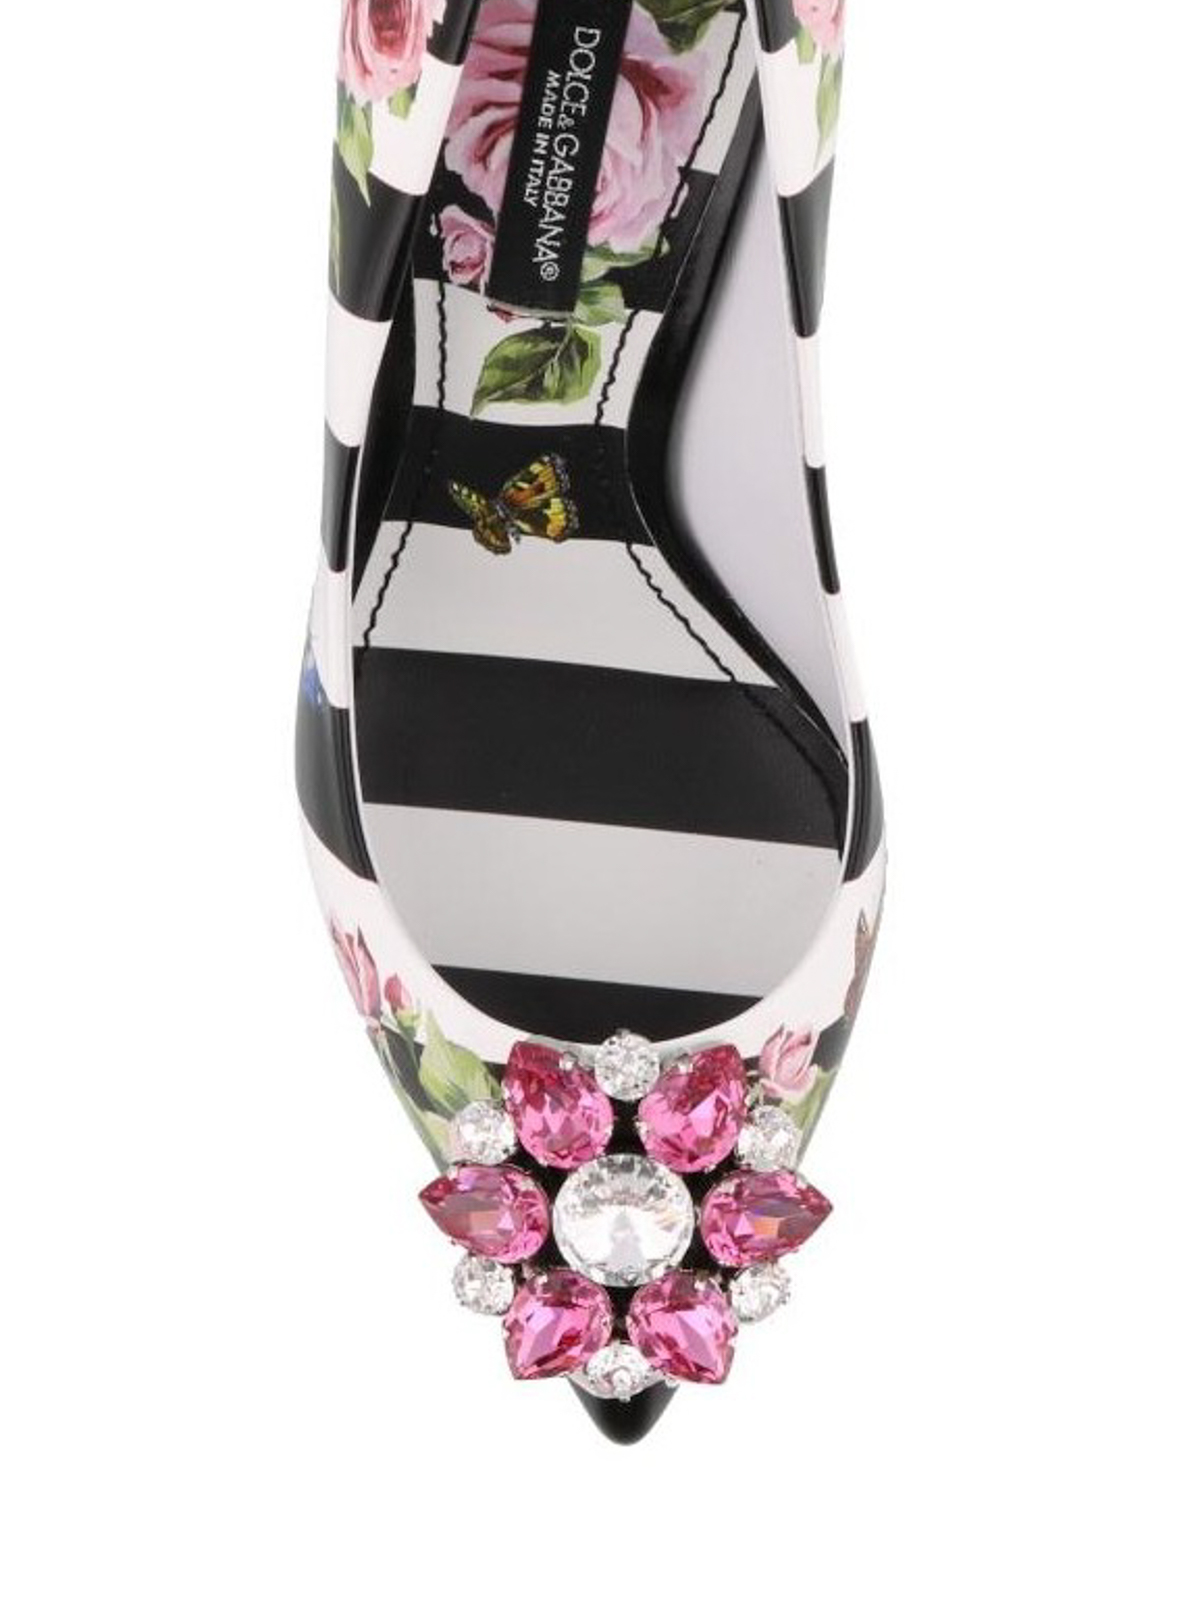 7aeca43605e2 iKRIX DOLCE   GABBANA  court shoes - Rose print striped leather pumps